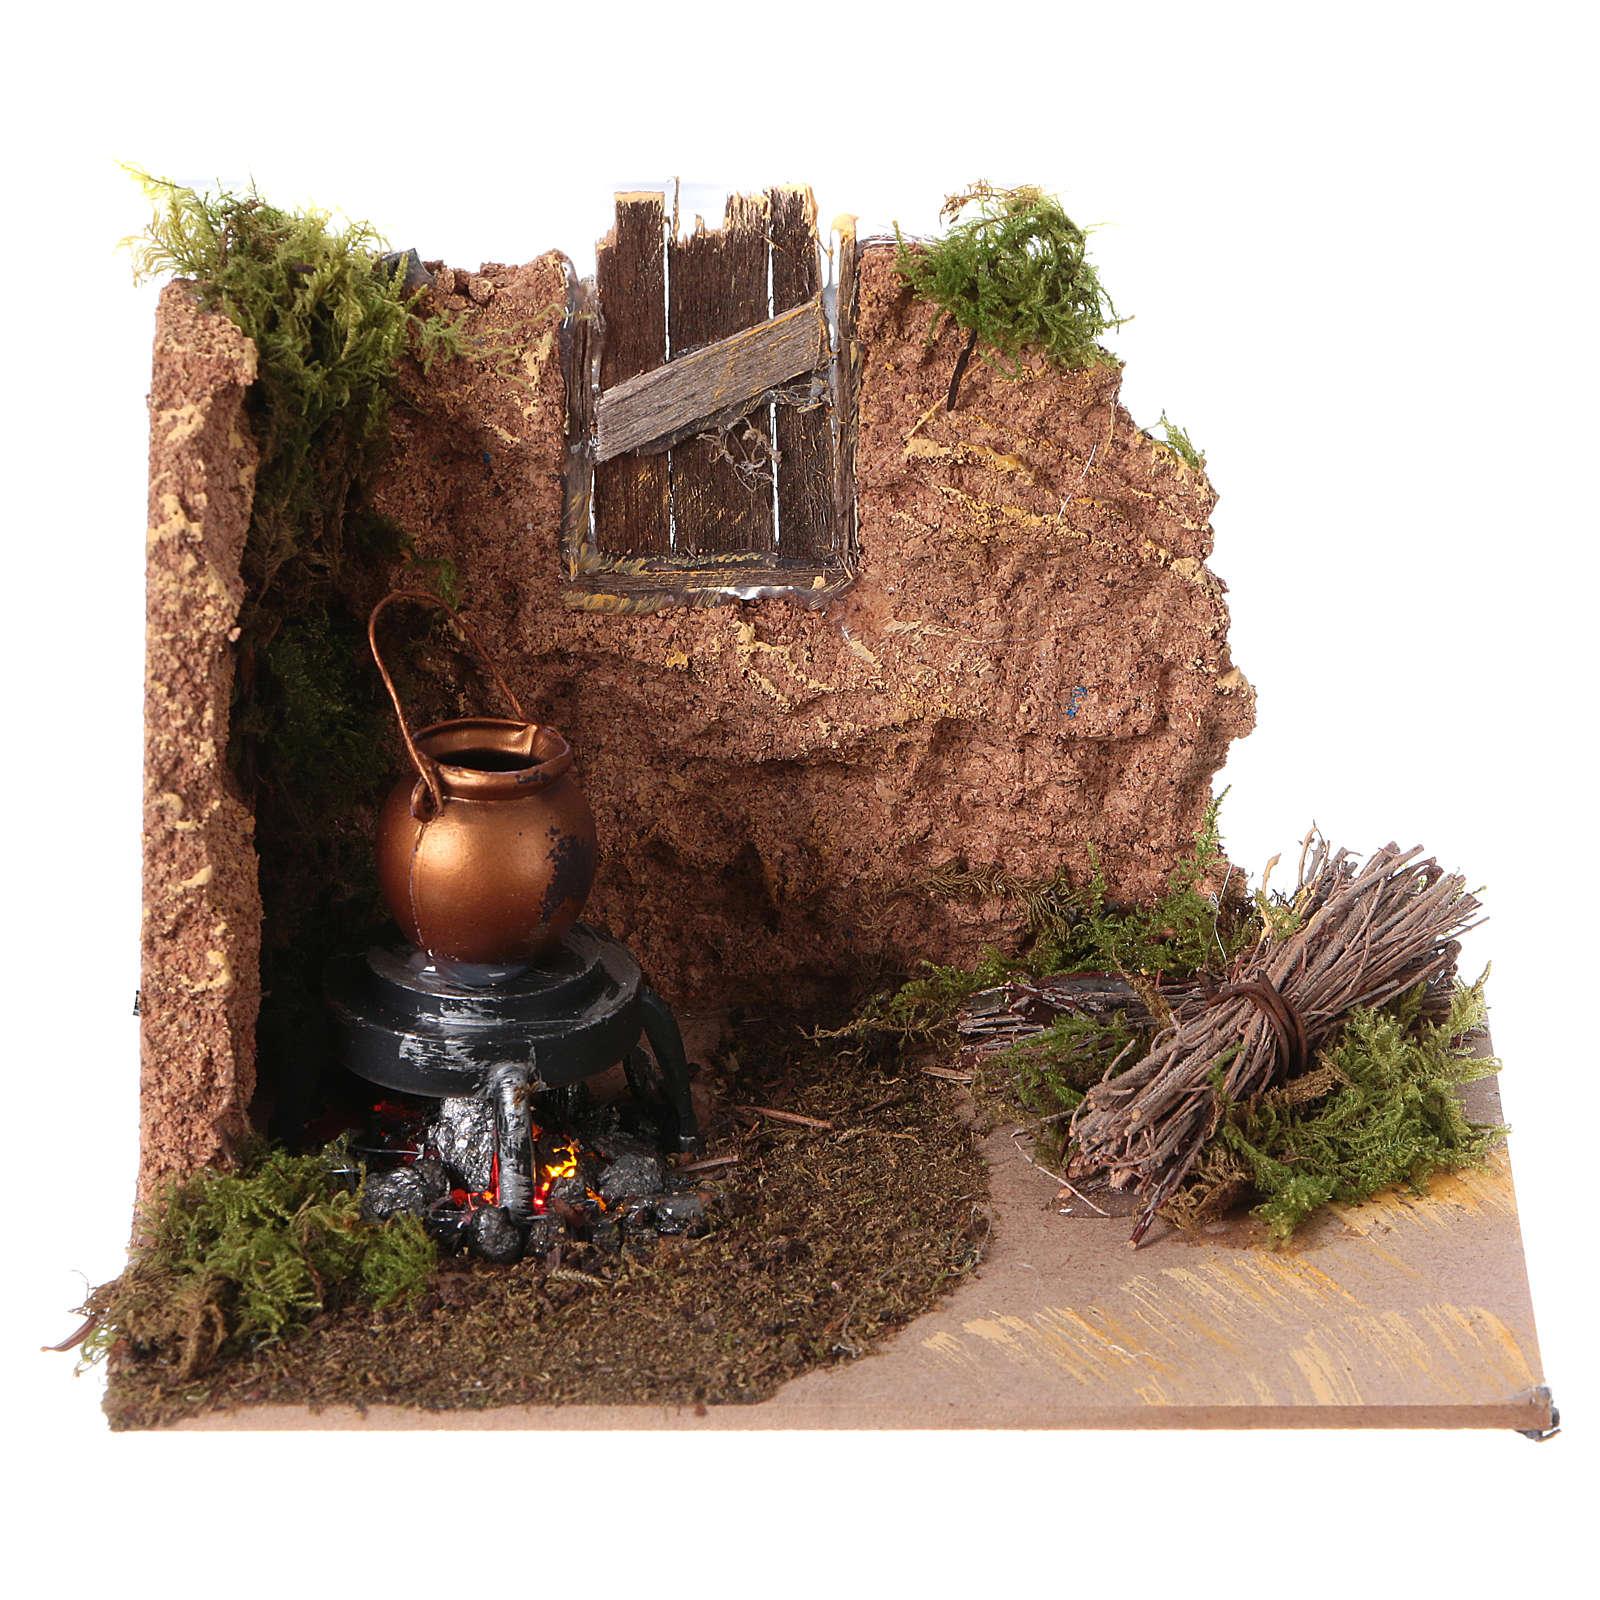 Nativity setting, battery powered fire measuring 10x15cm 4